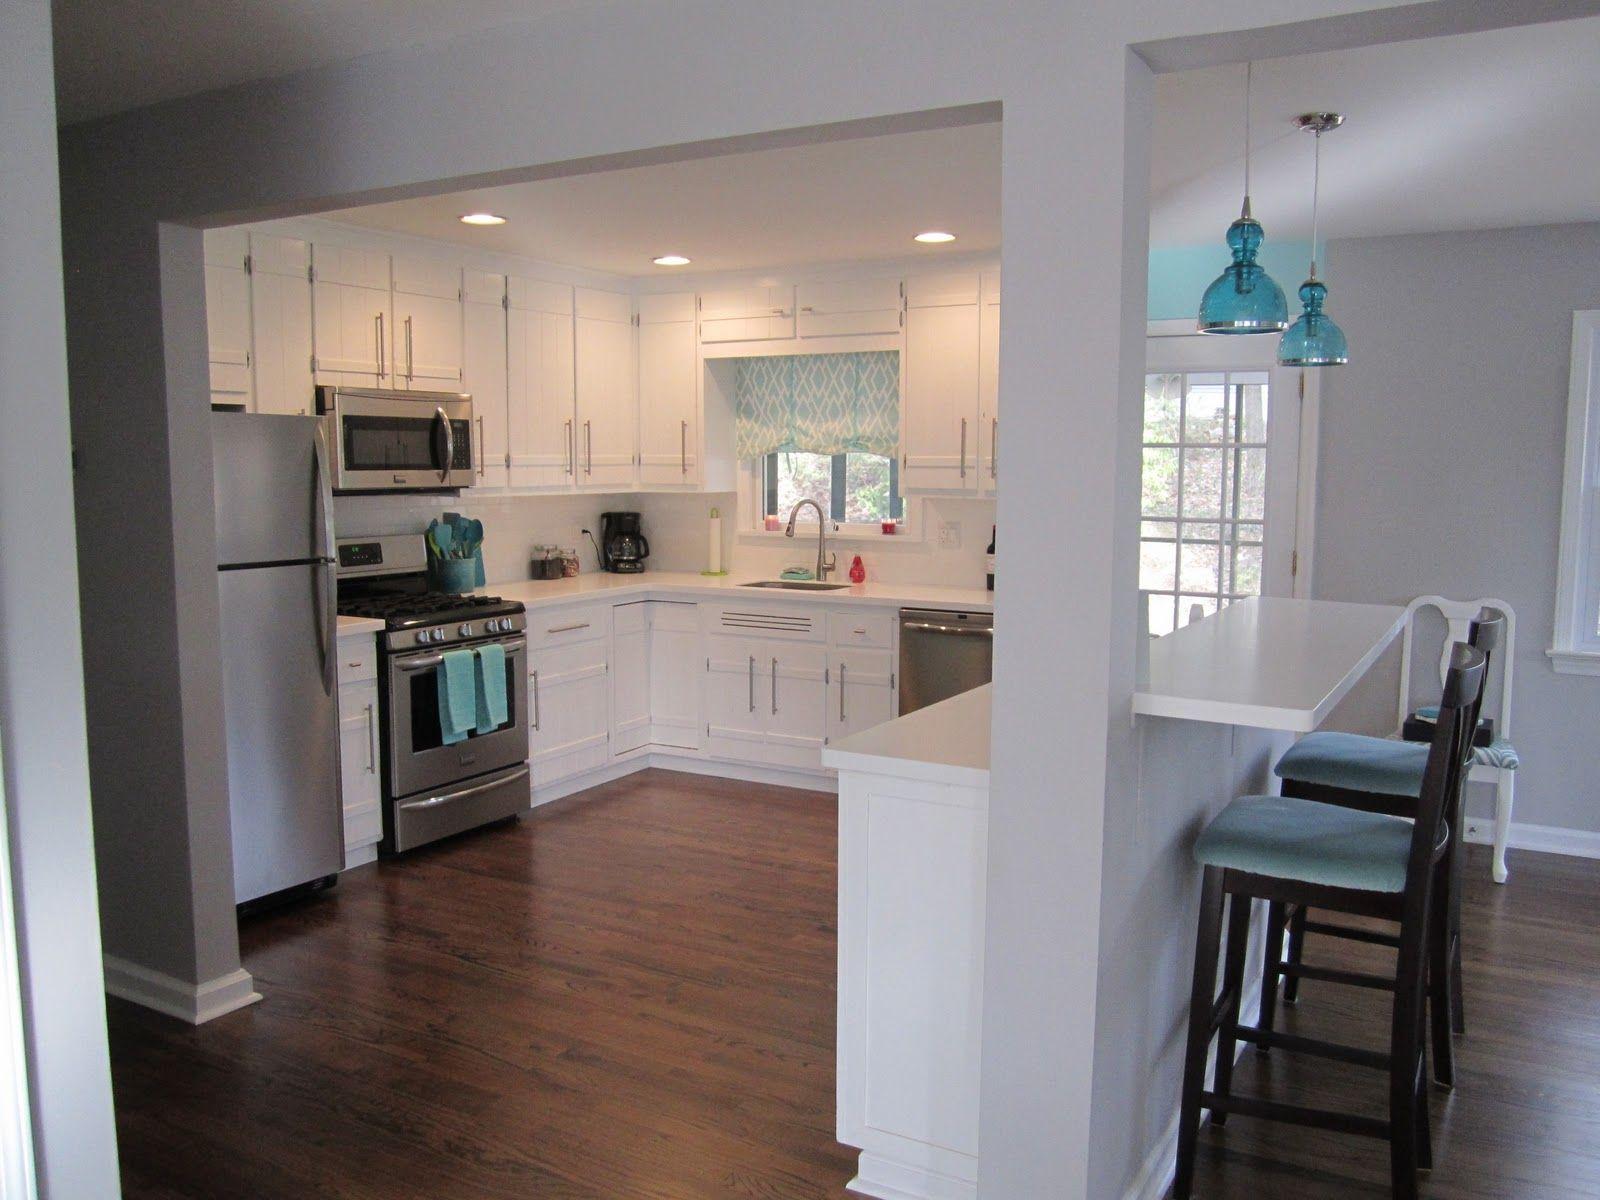 Home Kitchen Interior Design Pos | Great Home Design Pos Interior Pictures Loft Home Design